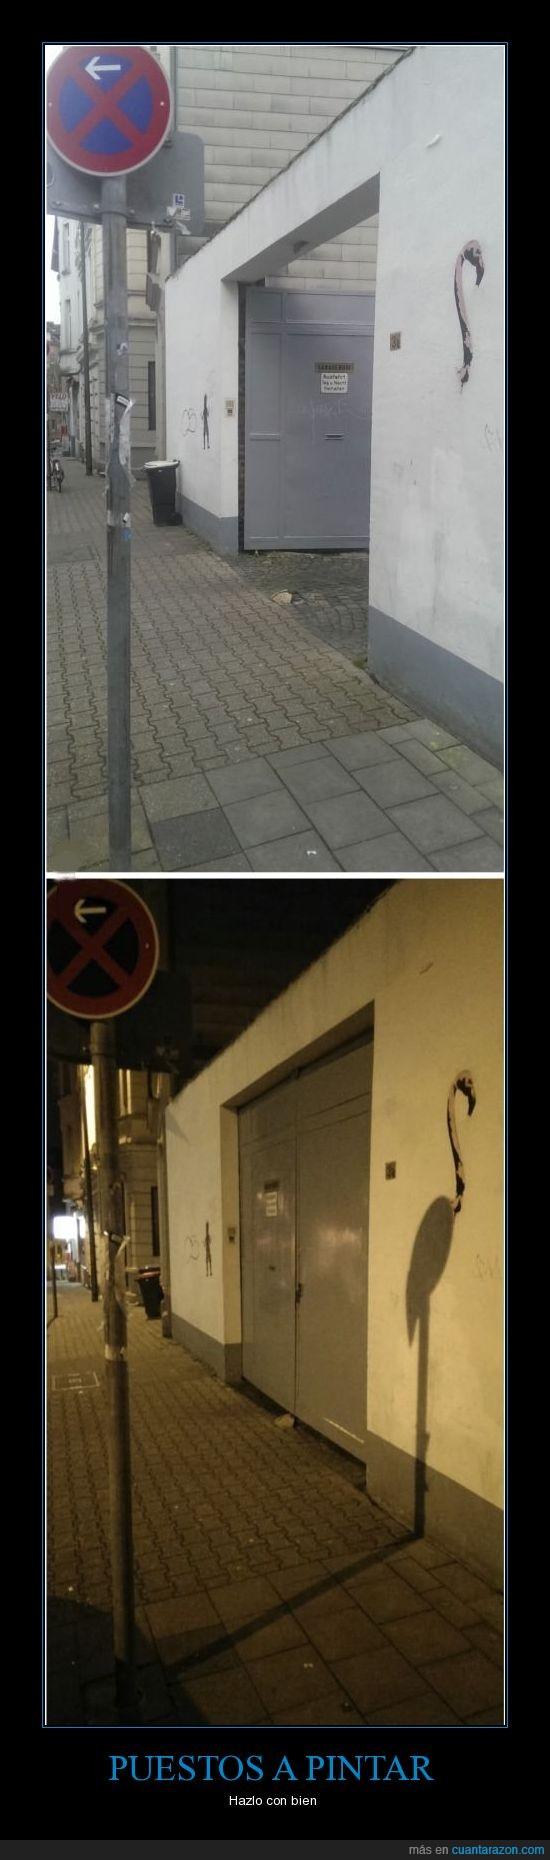 flamenco,graffiti,pintar,señal,sombra